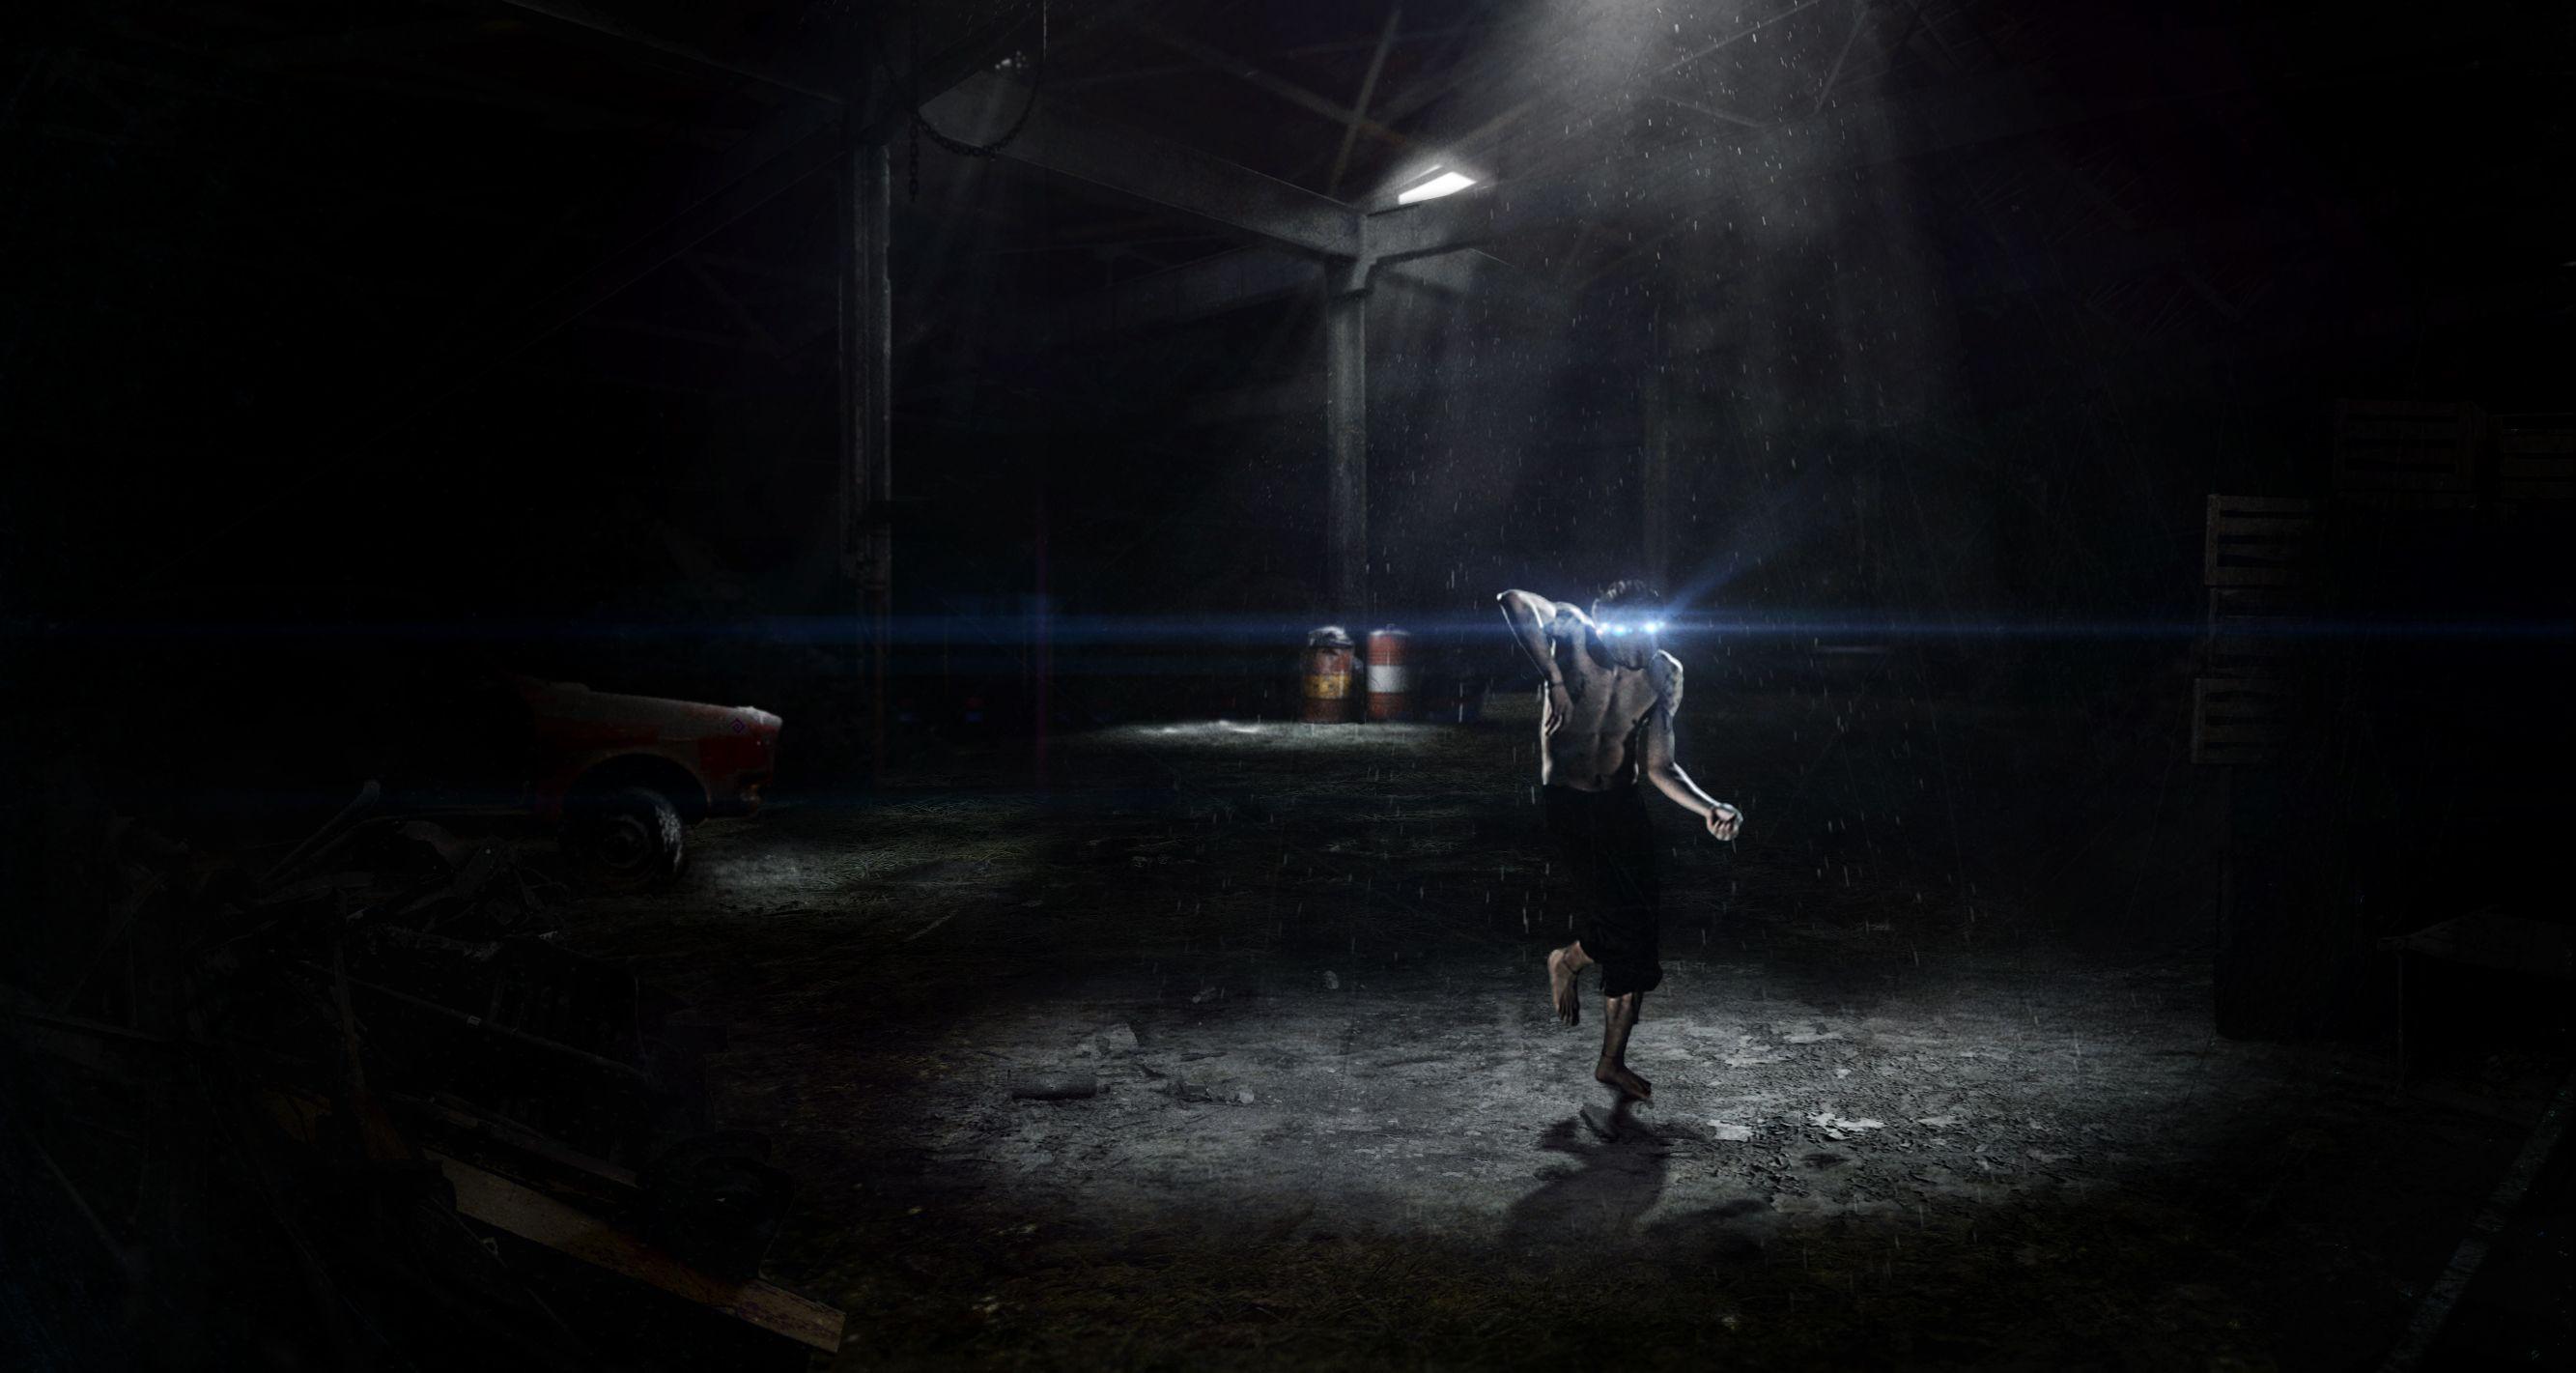 Arte Final Nexus 7 https://vimeo.com/97690584